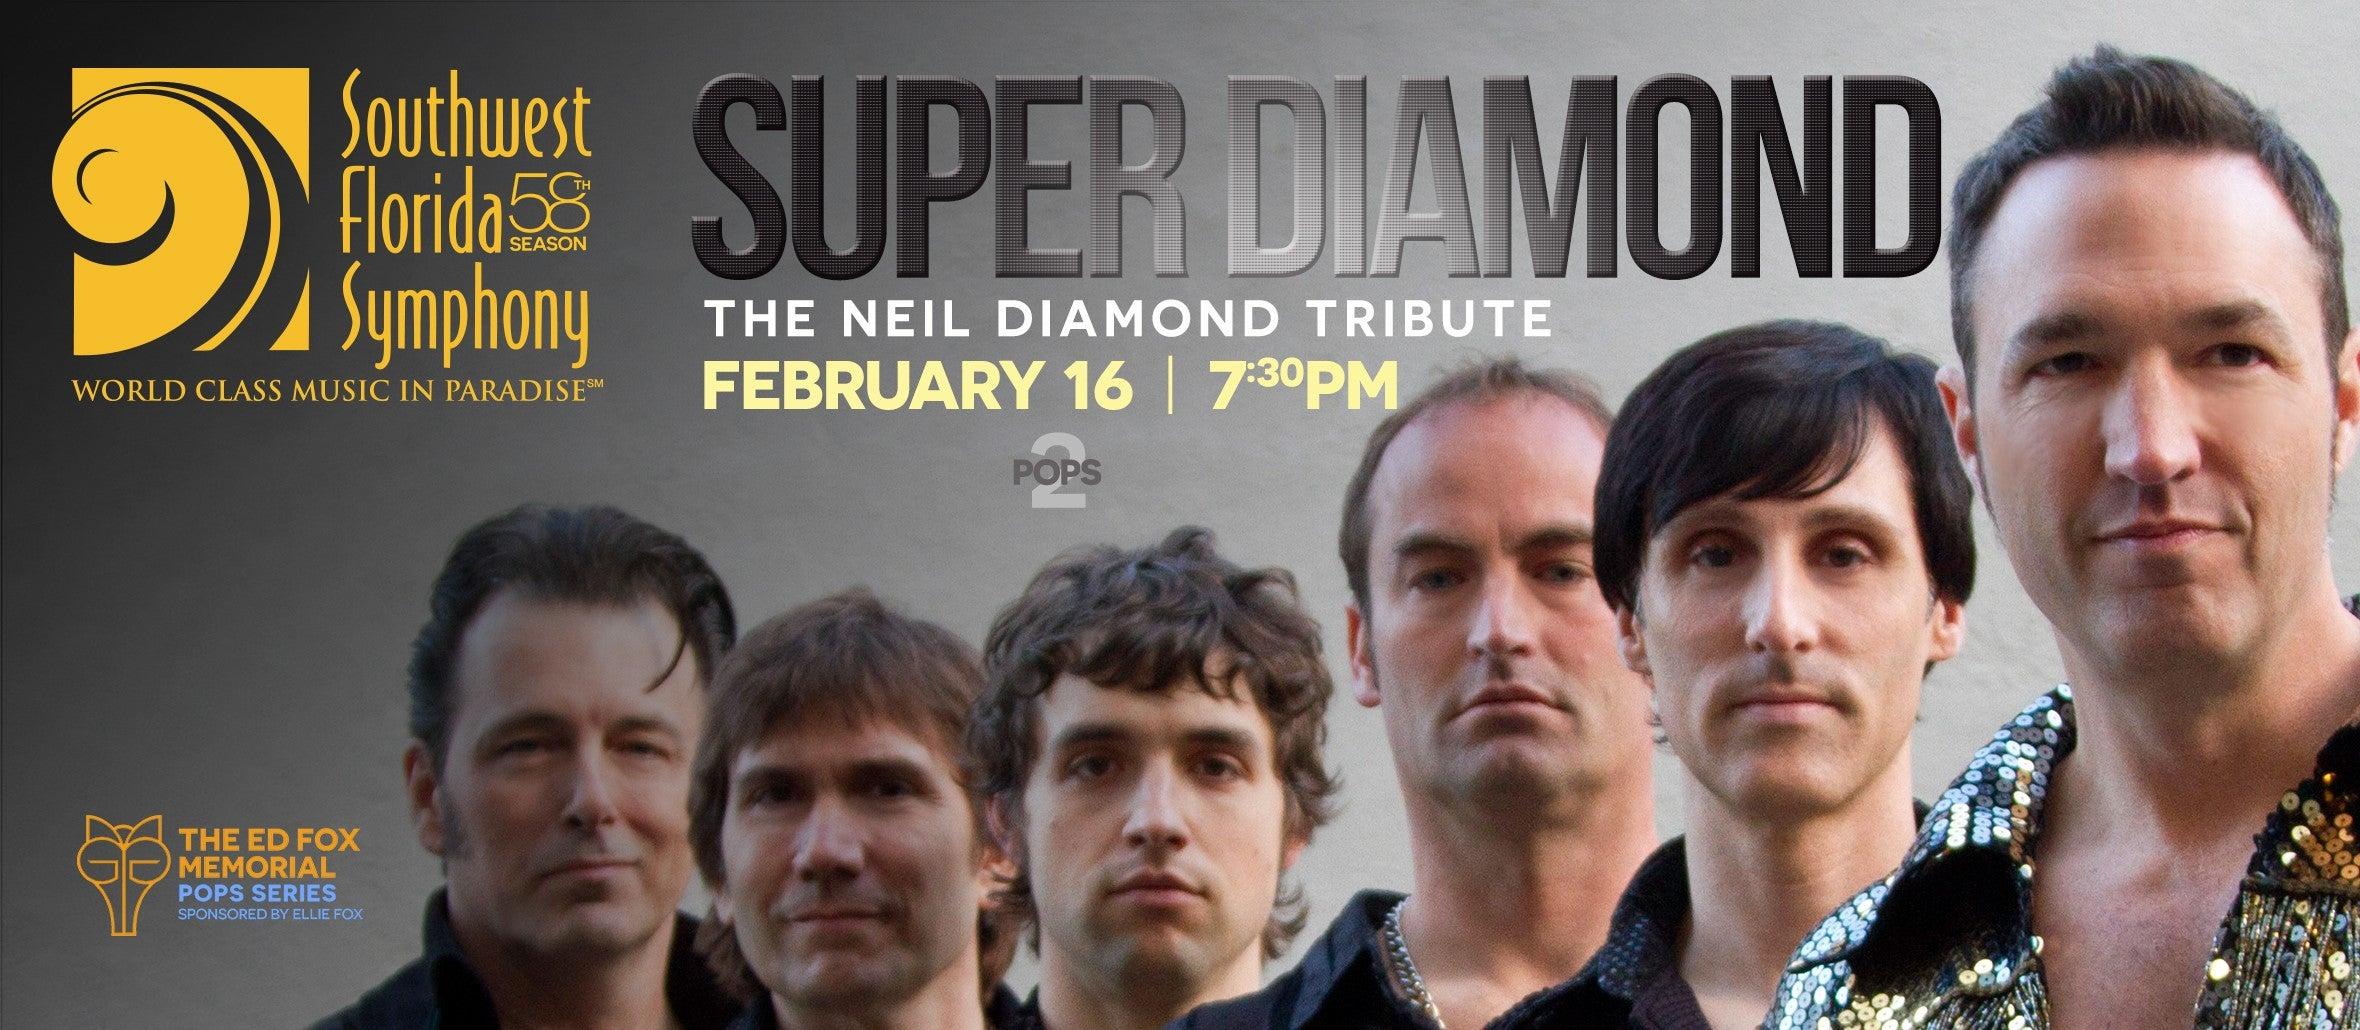 Southwest Florida Symphony: Super Diamond